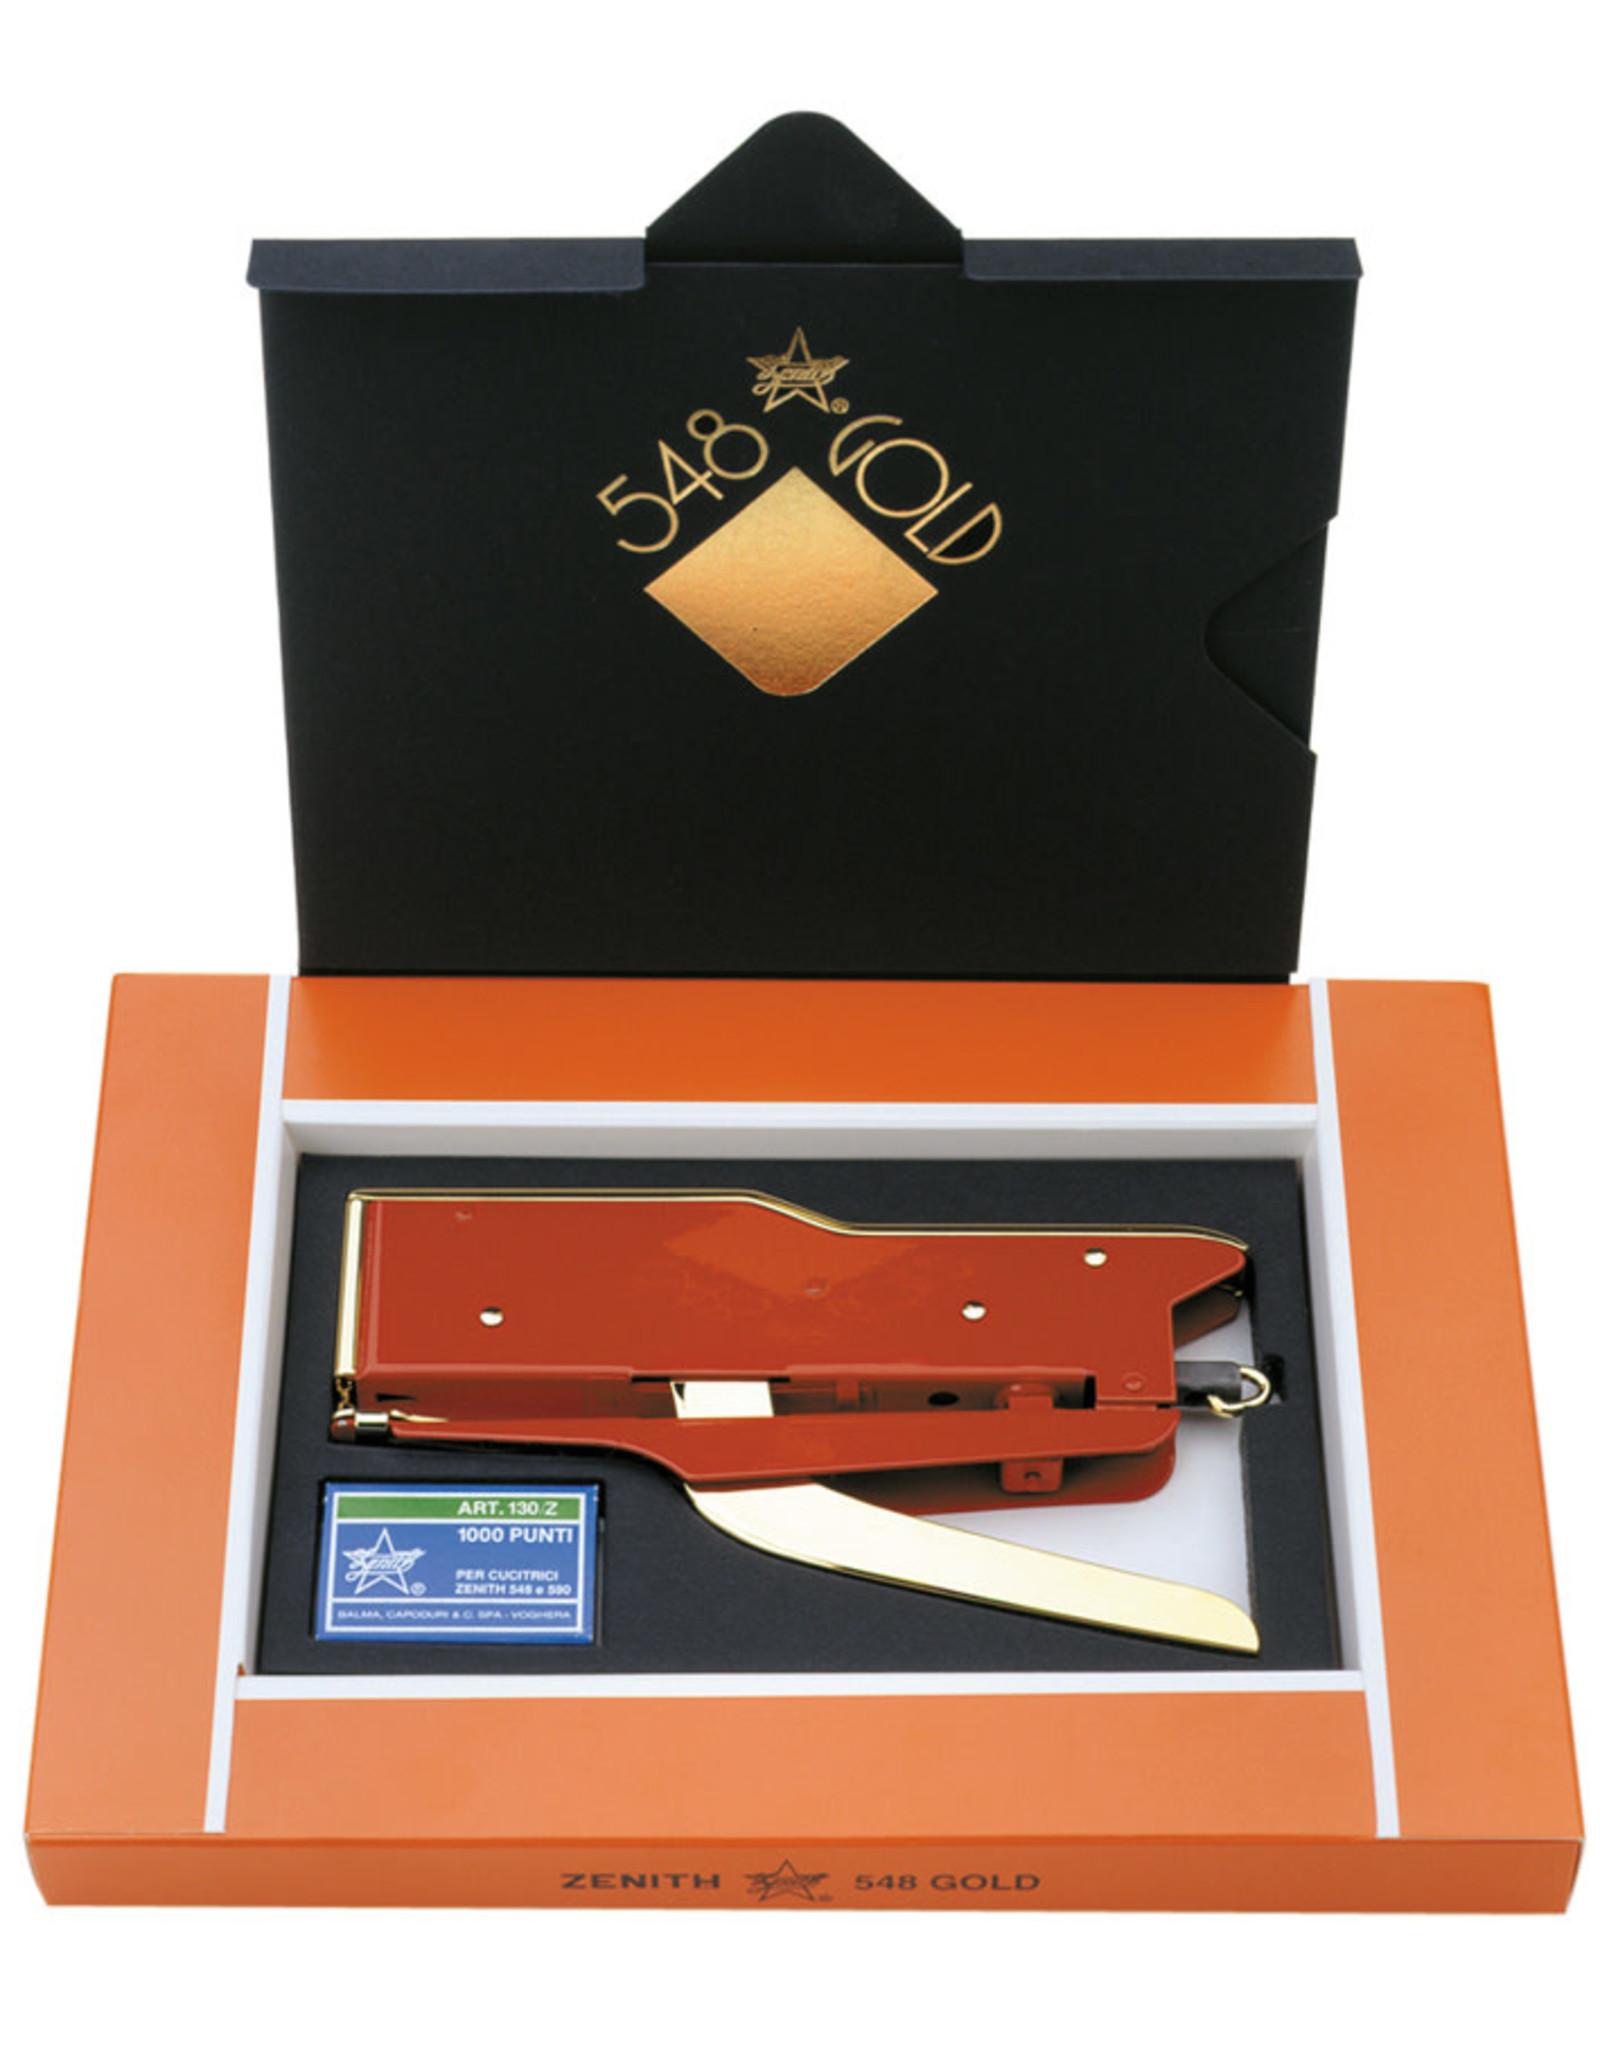 Zenith Stapler 548 Gold collection